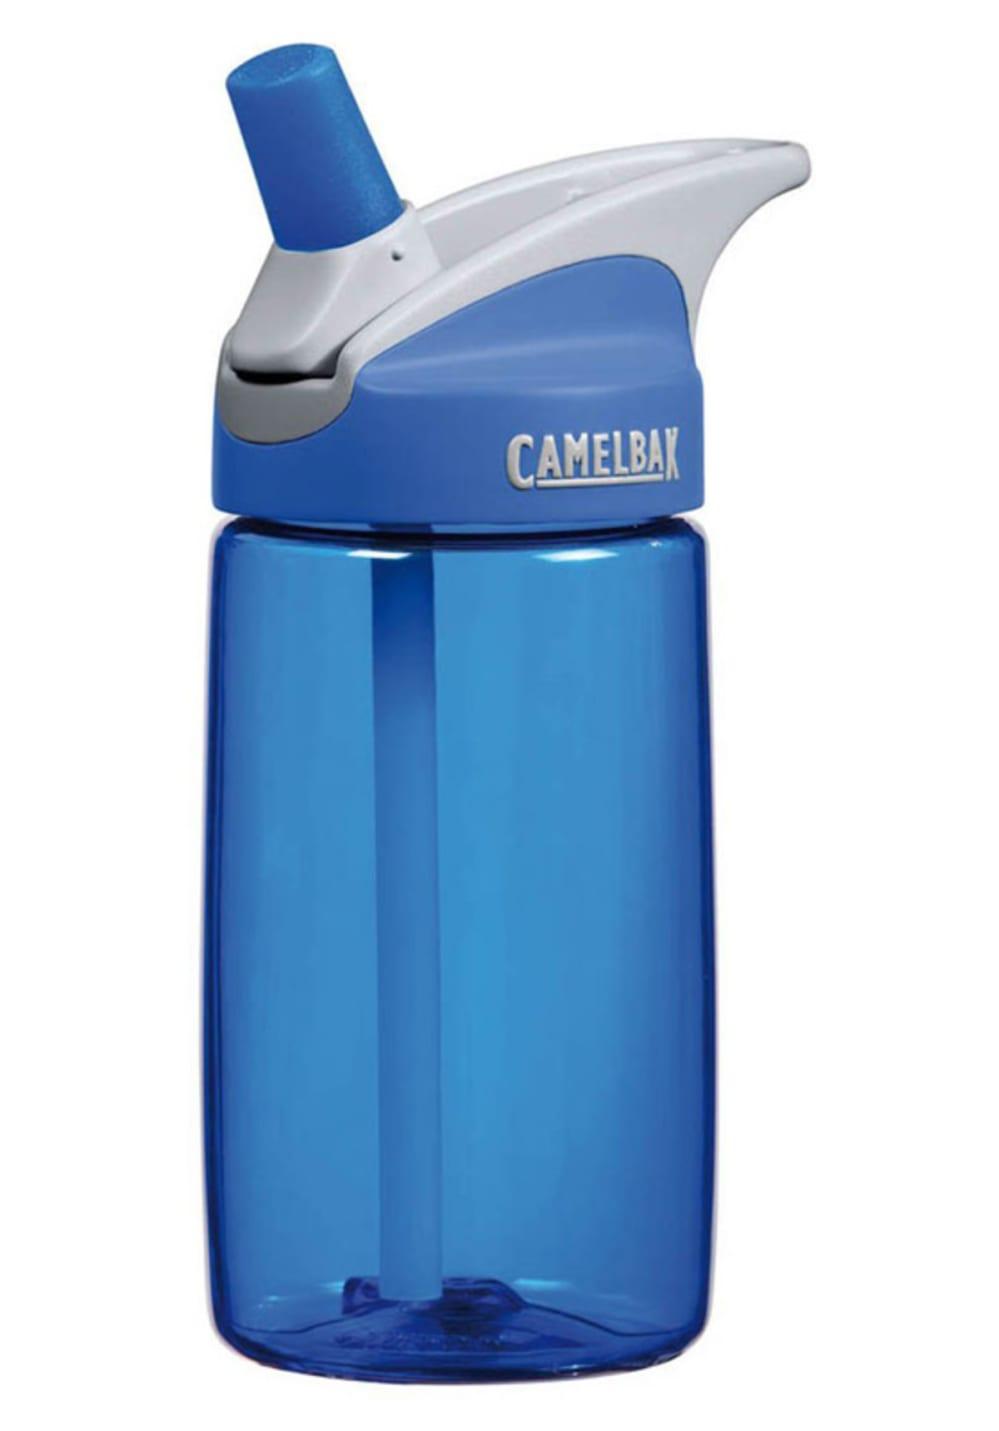 Camelbak Kids Better Bottle 400 ml Blue Trinkflaschen & Halter - Blau, Gr. One S